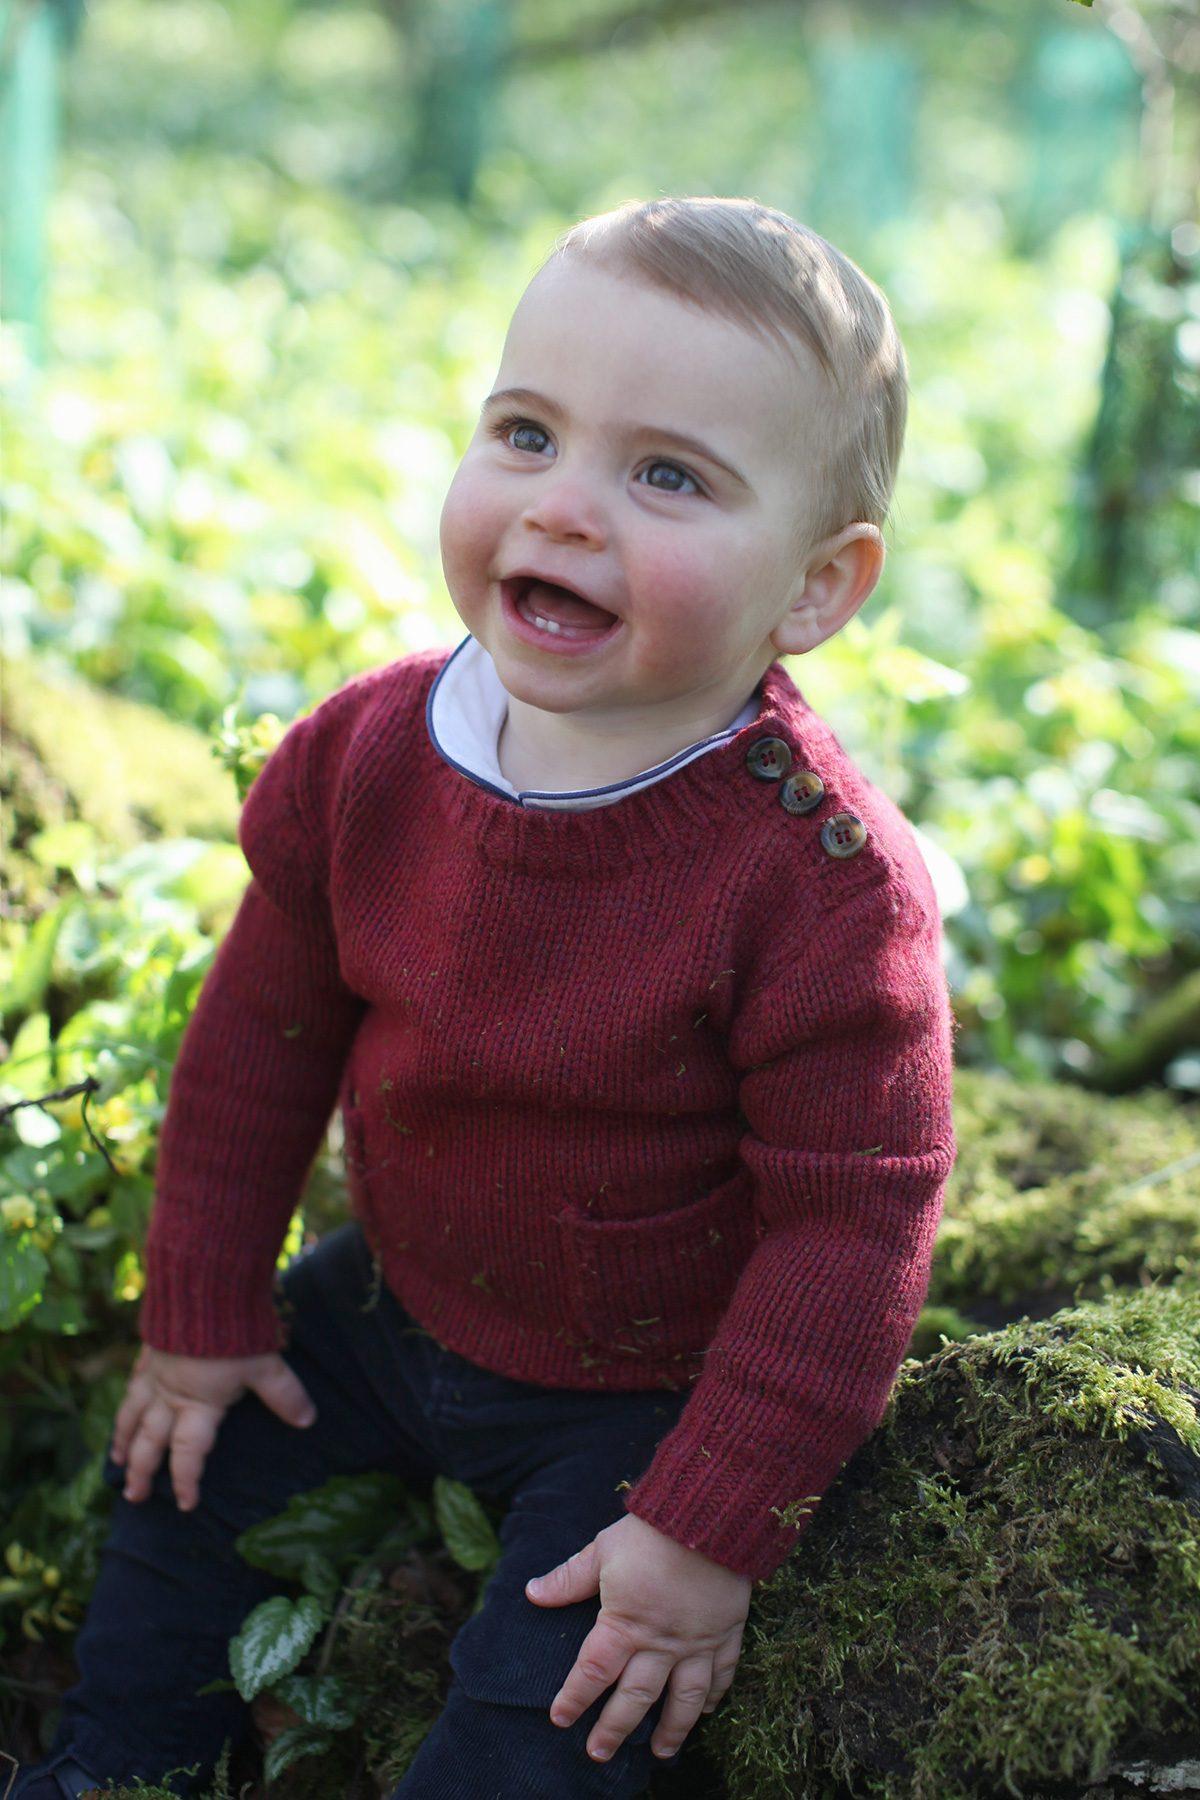 Prince Louis photoshoot